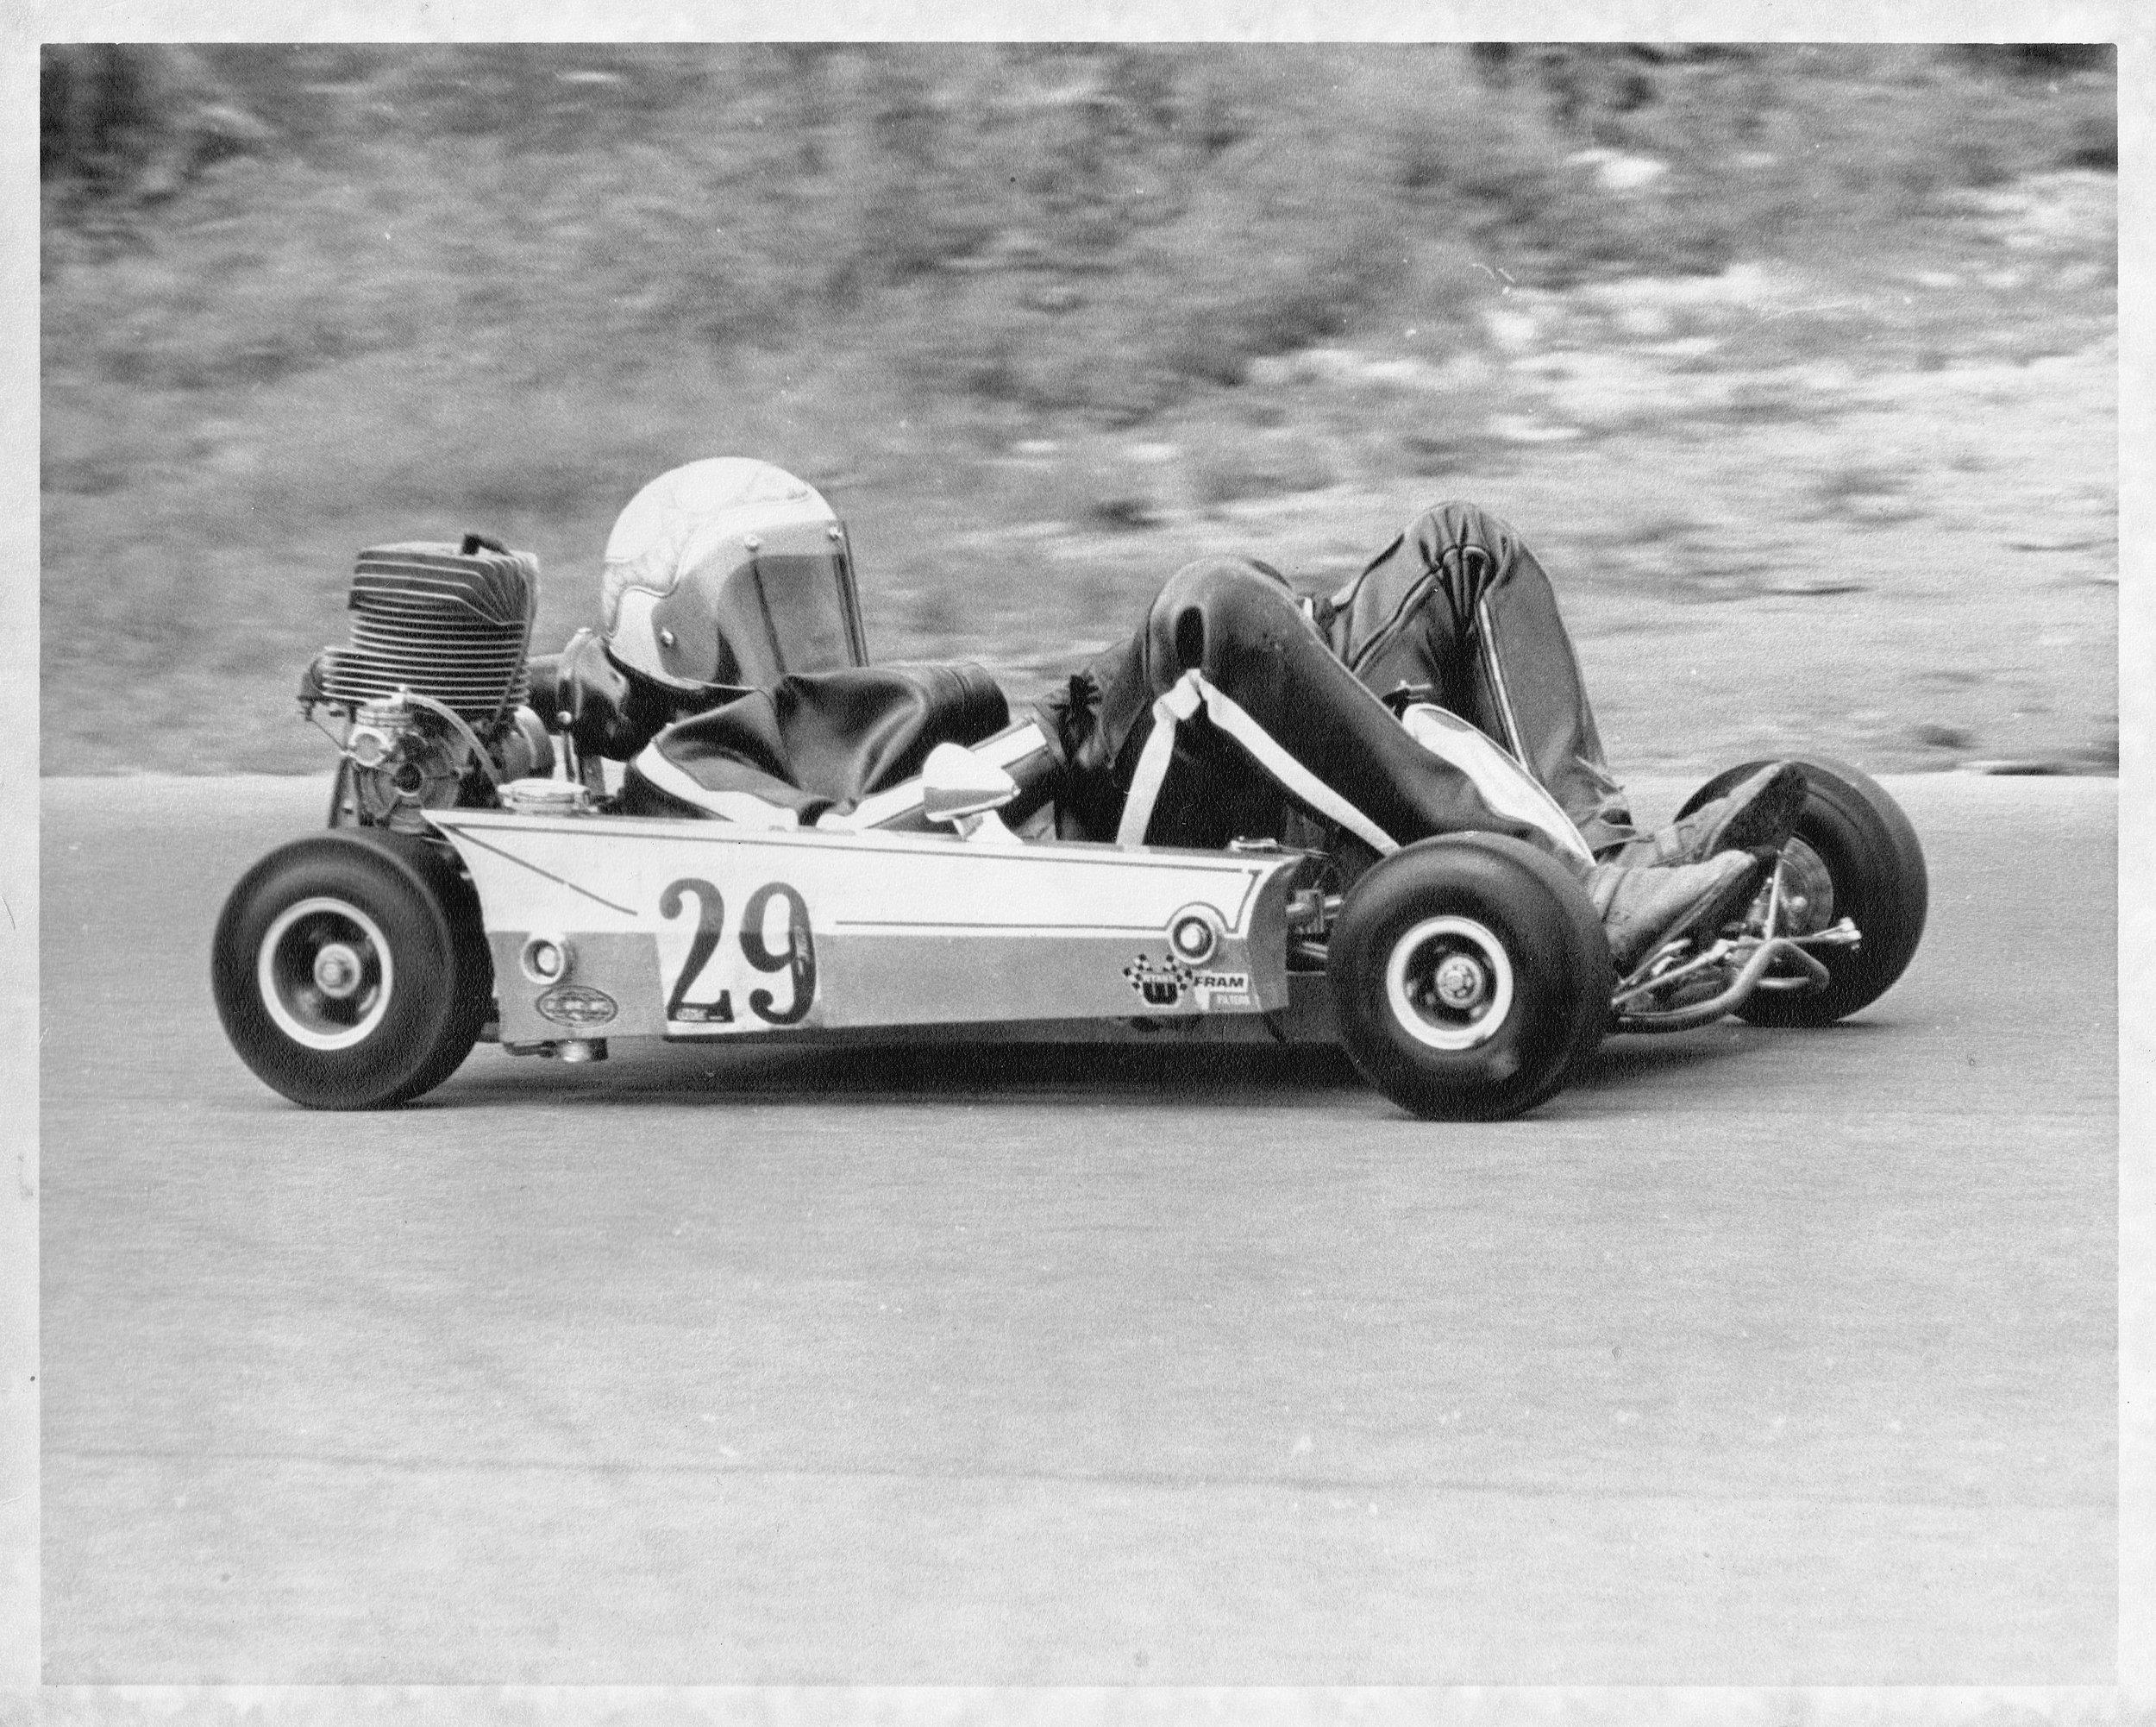 PHOTO_Dugan racing Go-KArt.jpg